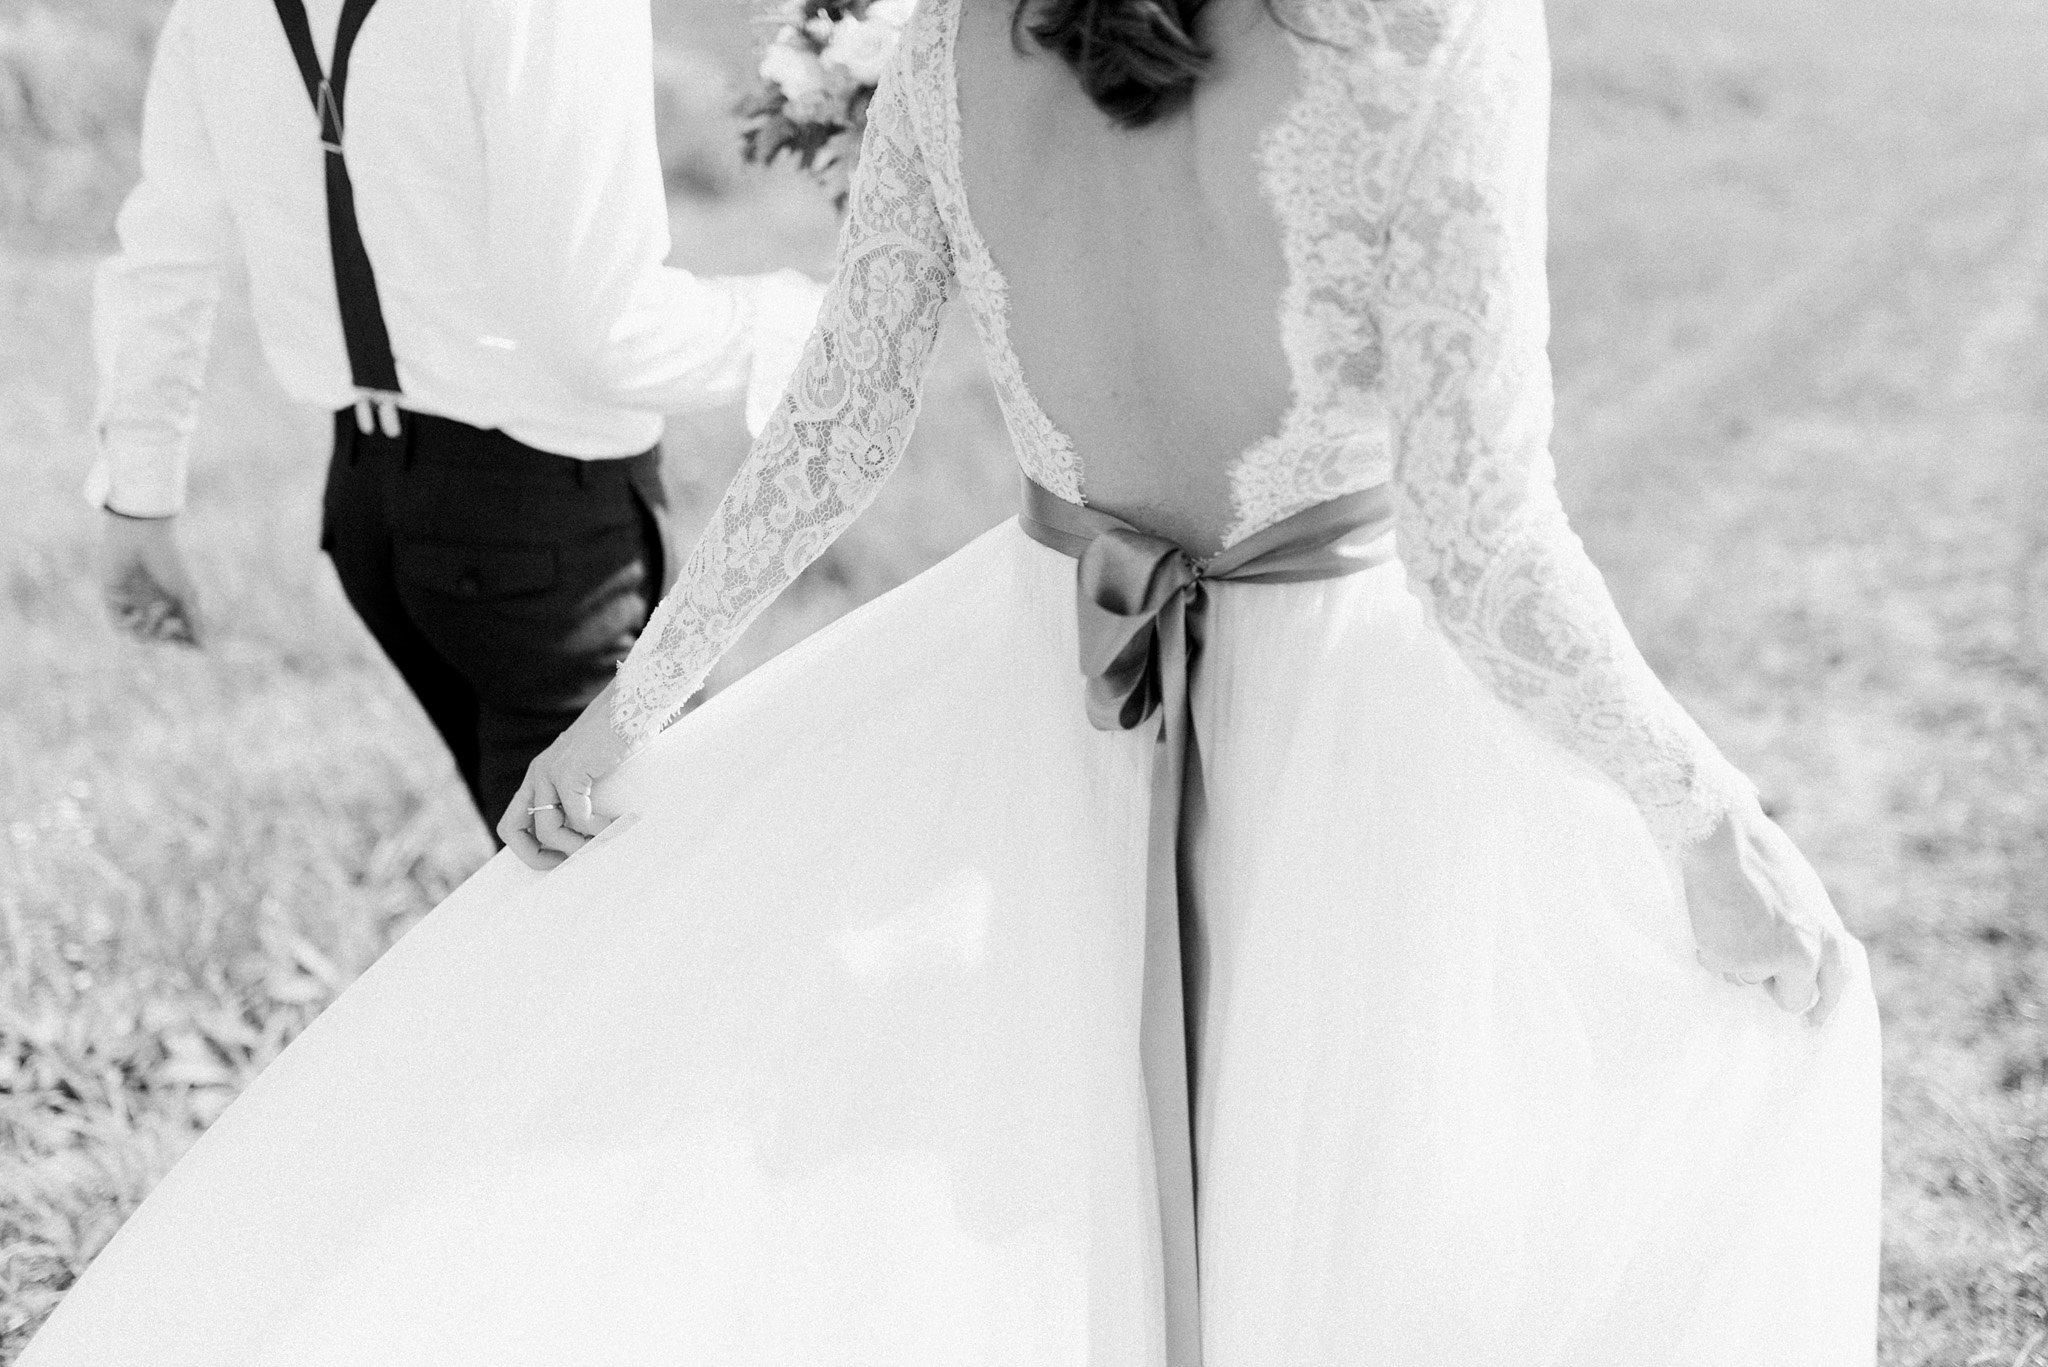 30-bride-groom-walking-field